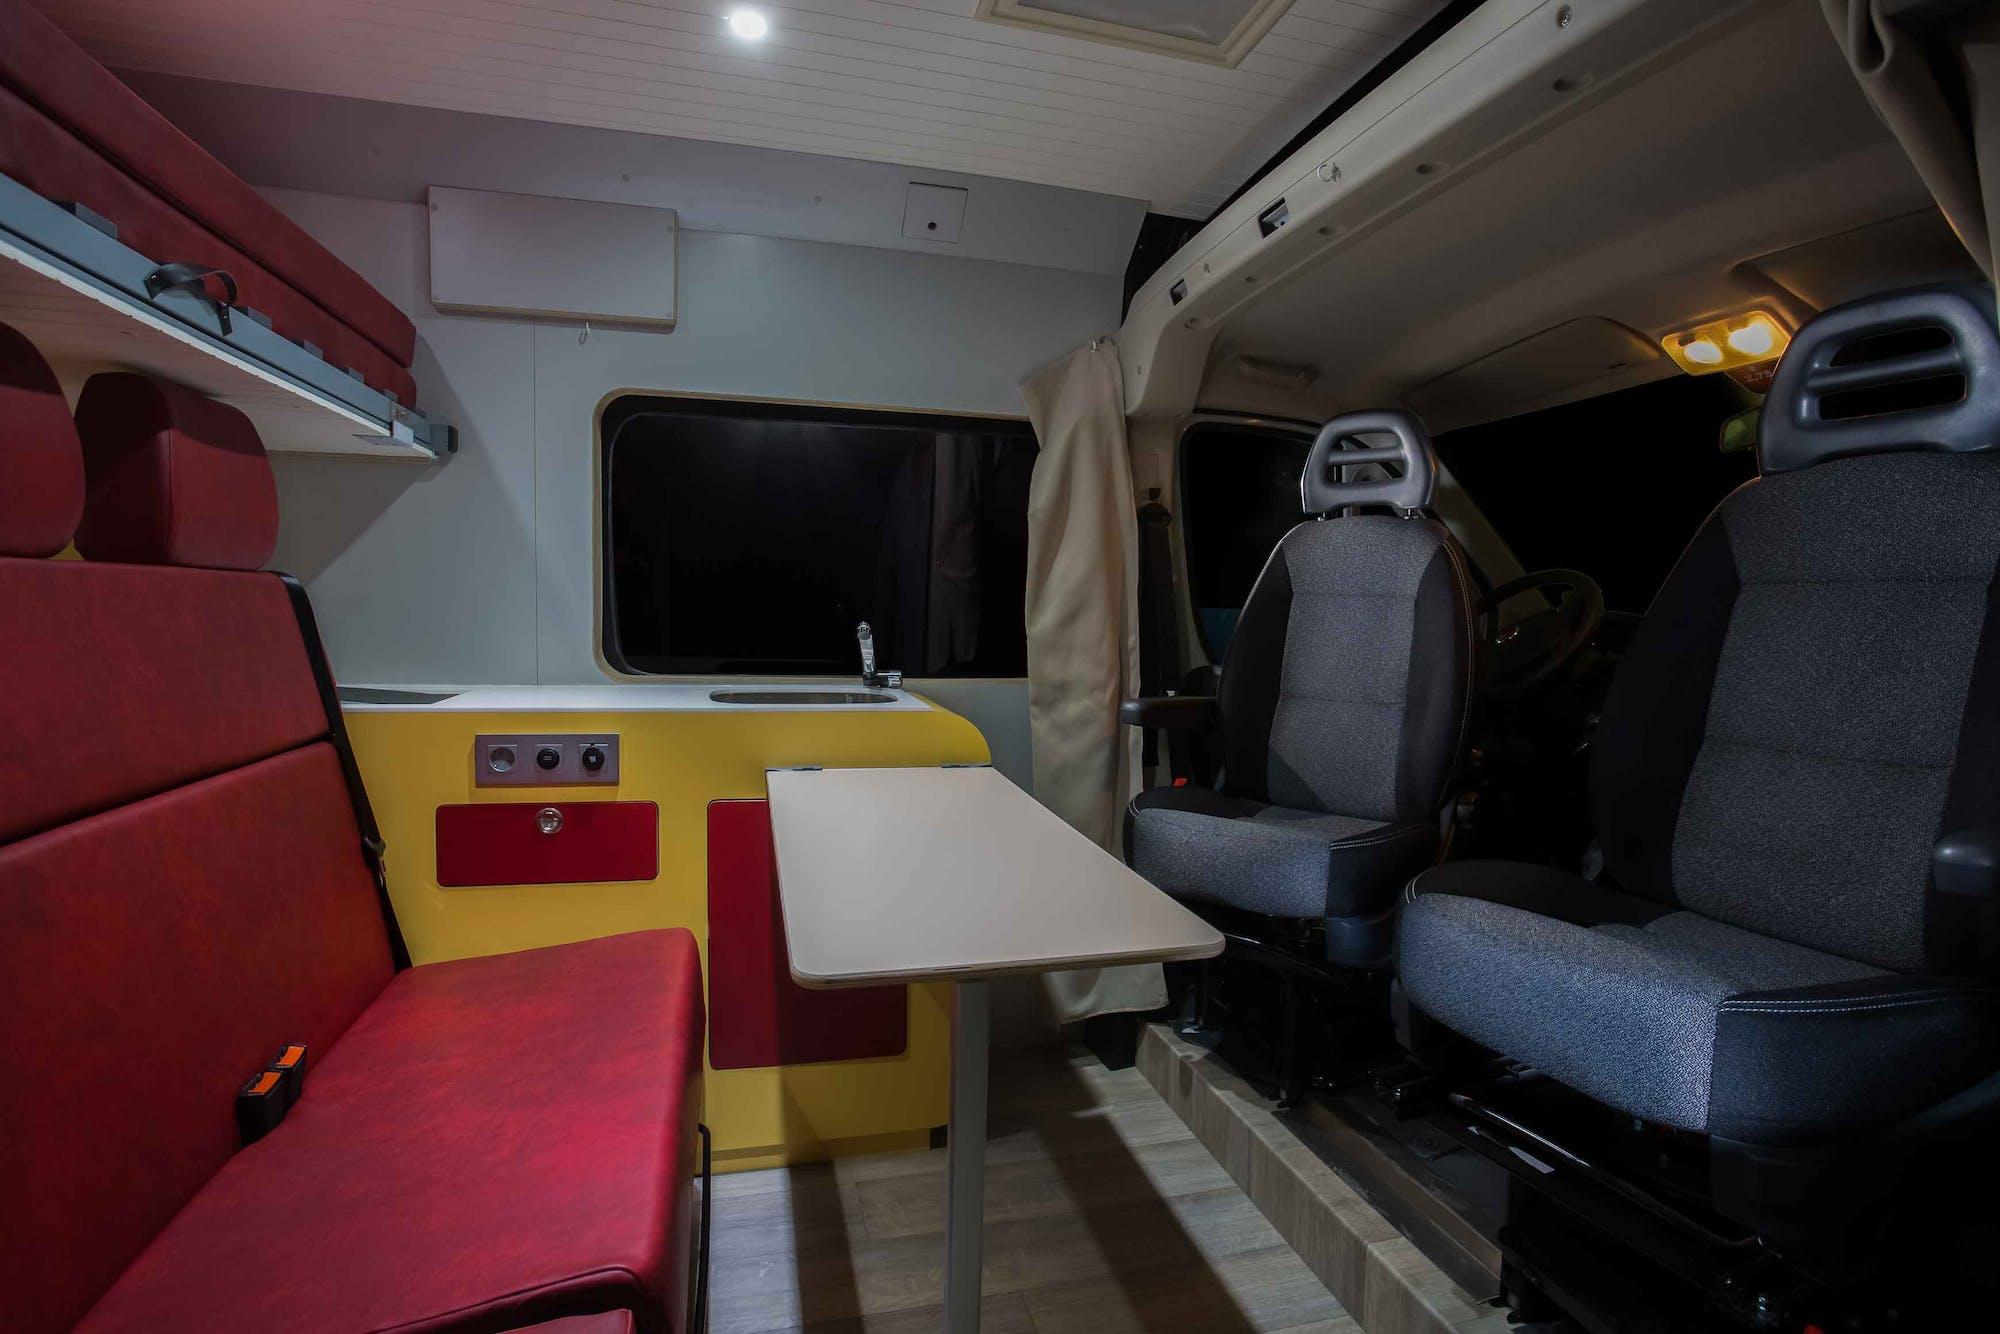 Sporty Model's interior seats